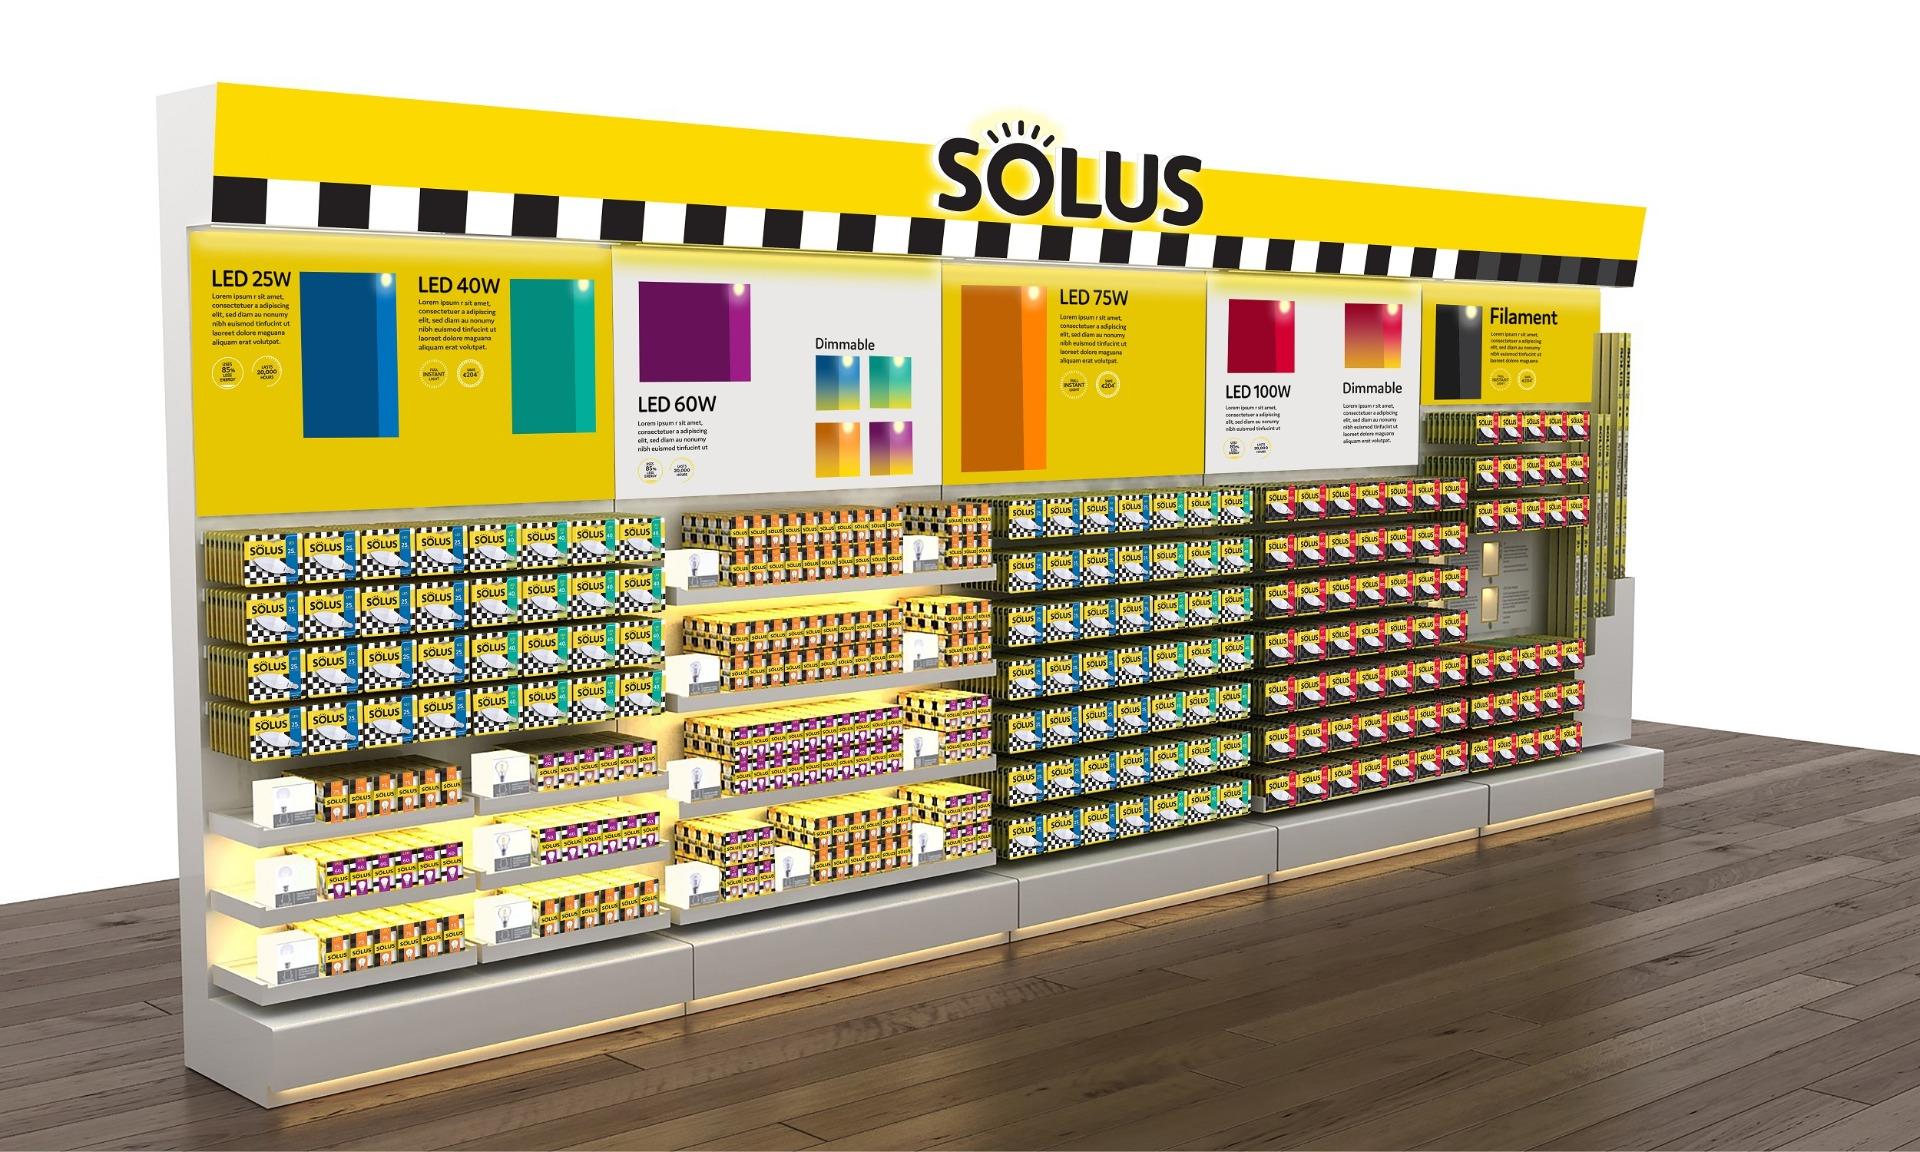 Solus_Instore_LightingCentre